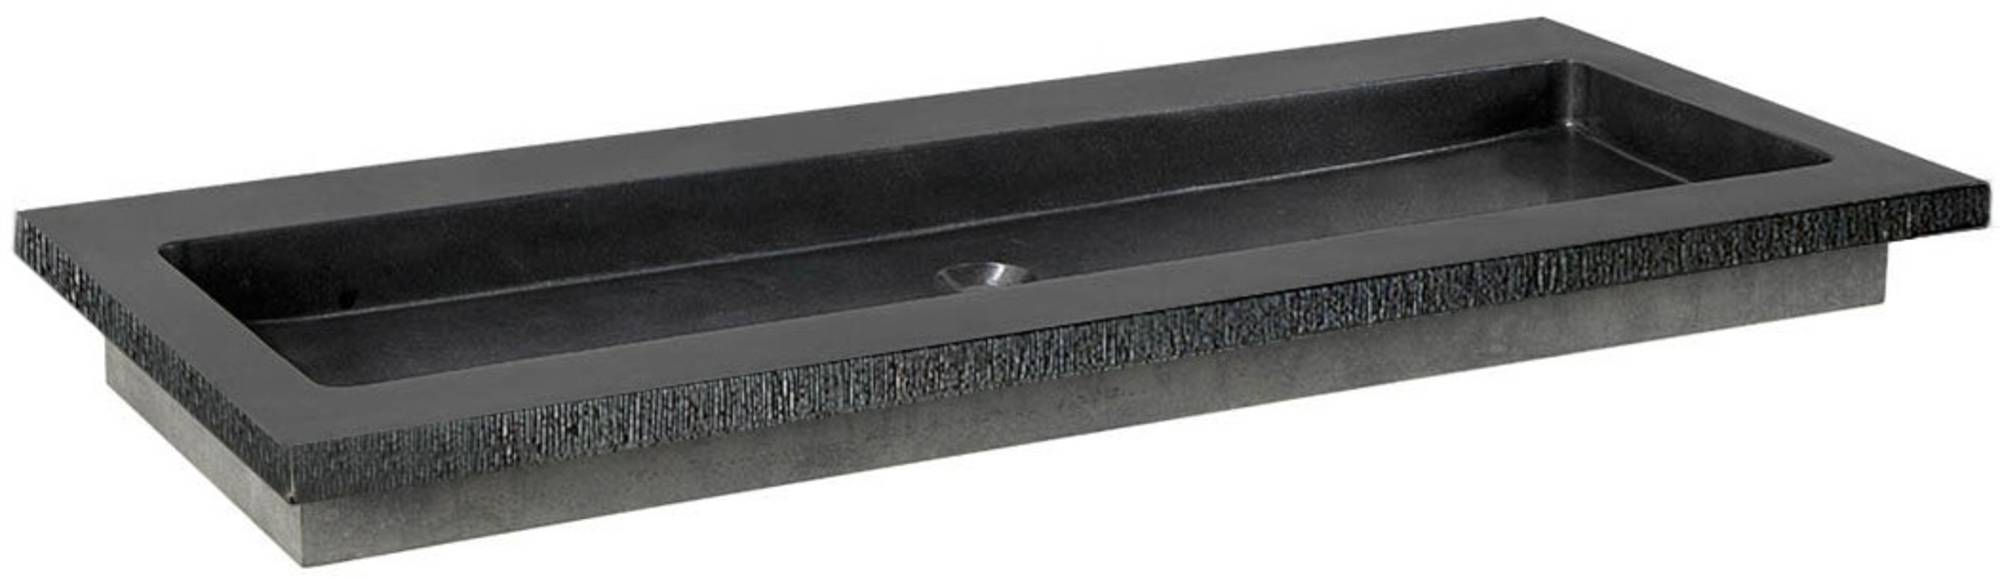 Ben Naturno Wastafel Graniet Gezoet Gefrijnd 120,5x51,5x3 cm zonder Krg. Zwart